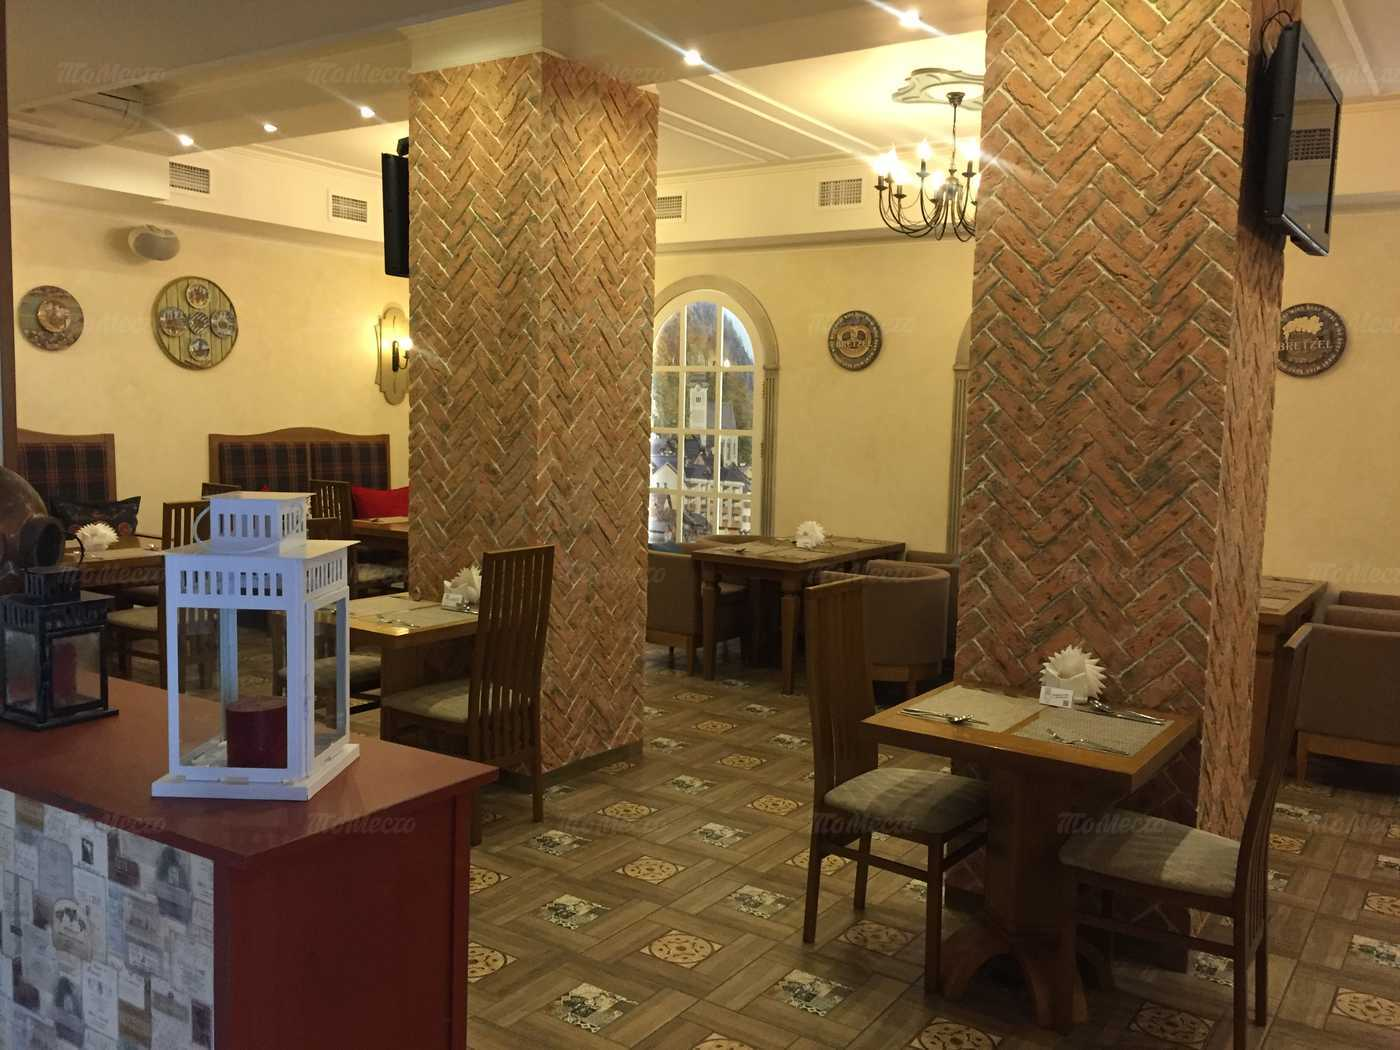 Ресторан Bretzel (Брецель) на улице Химиков фото 9